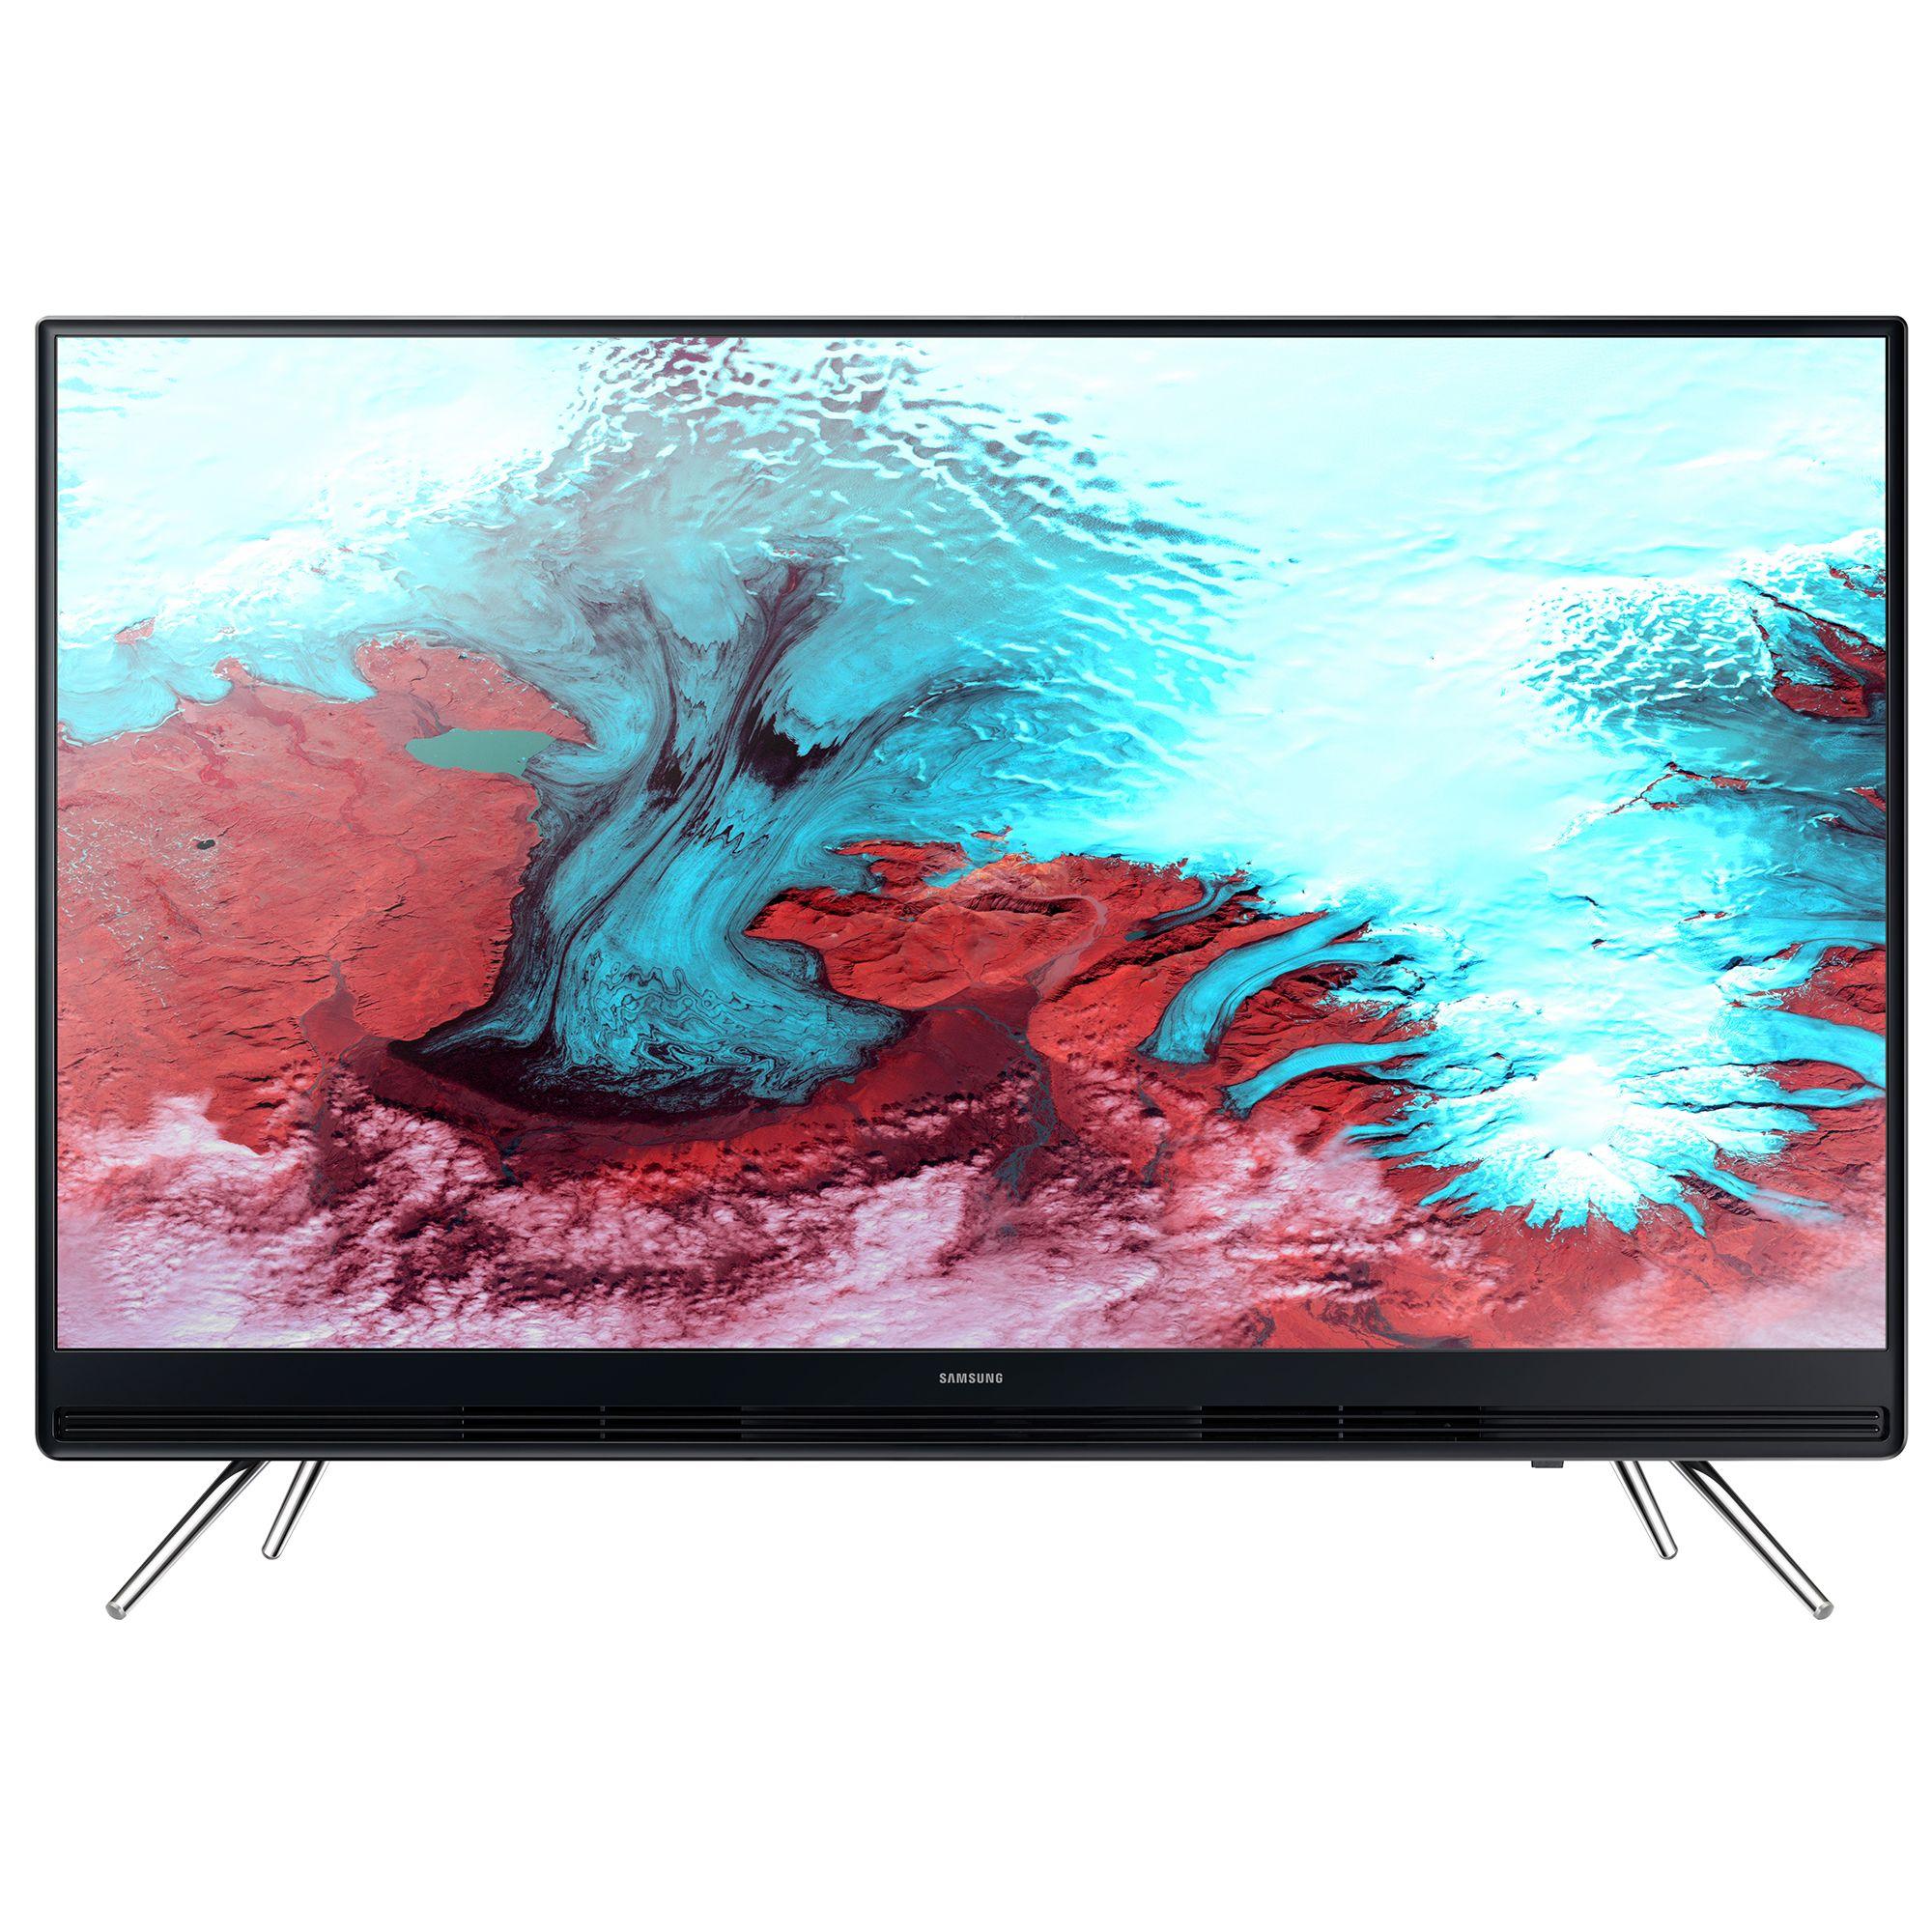 Televizor LED Samsung 80cm UE32K4102 HD Ready